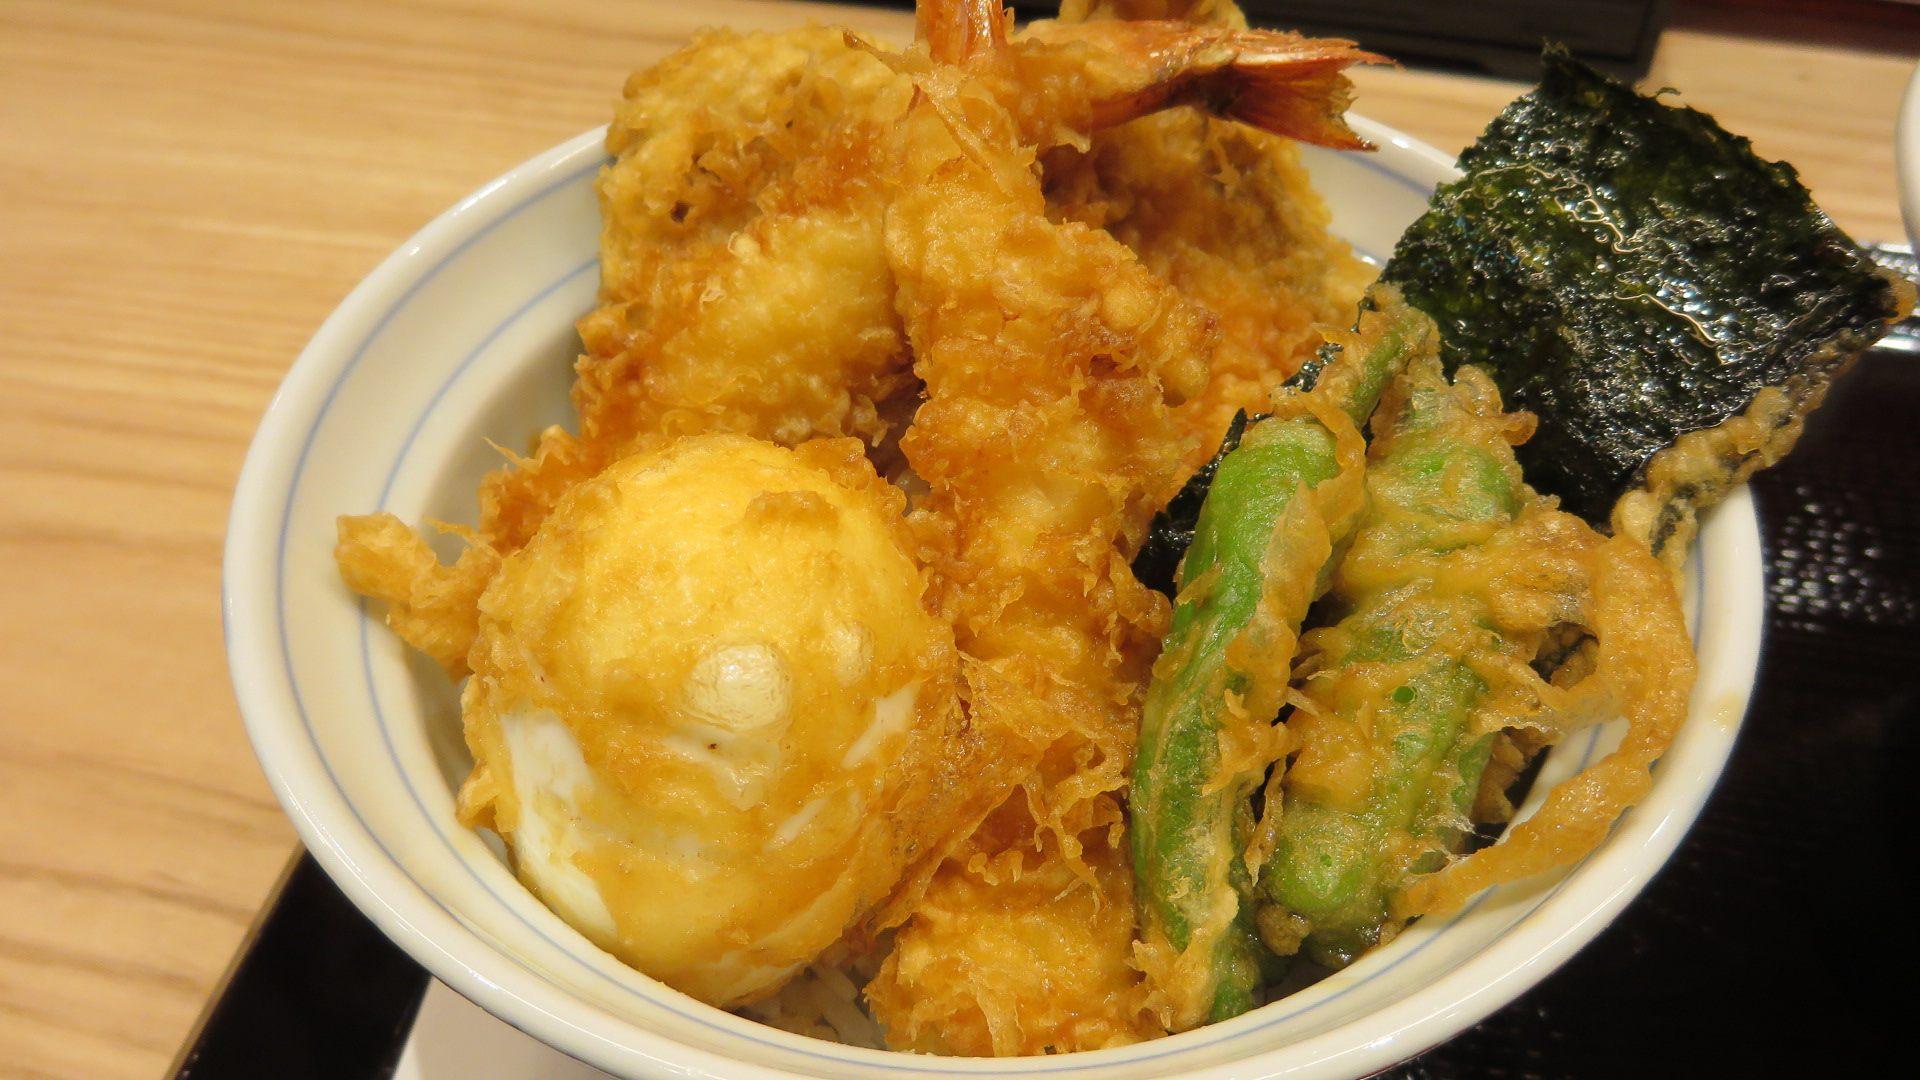 Tendon (2 Shrimp, 2 Vegetables, 1 Seafood, 1 Tempura Soft-Boiled Egg)